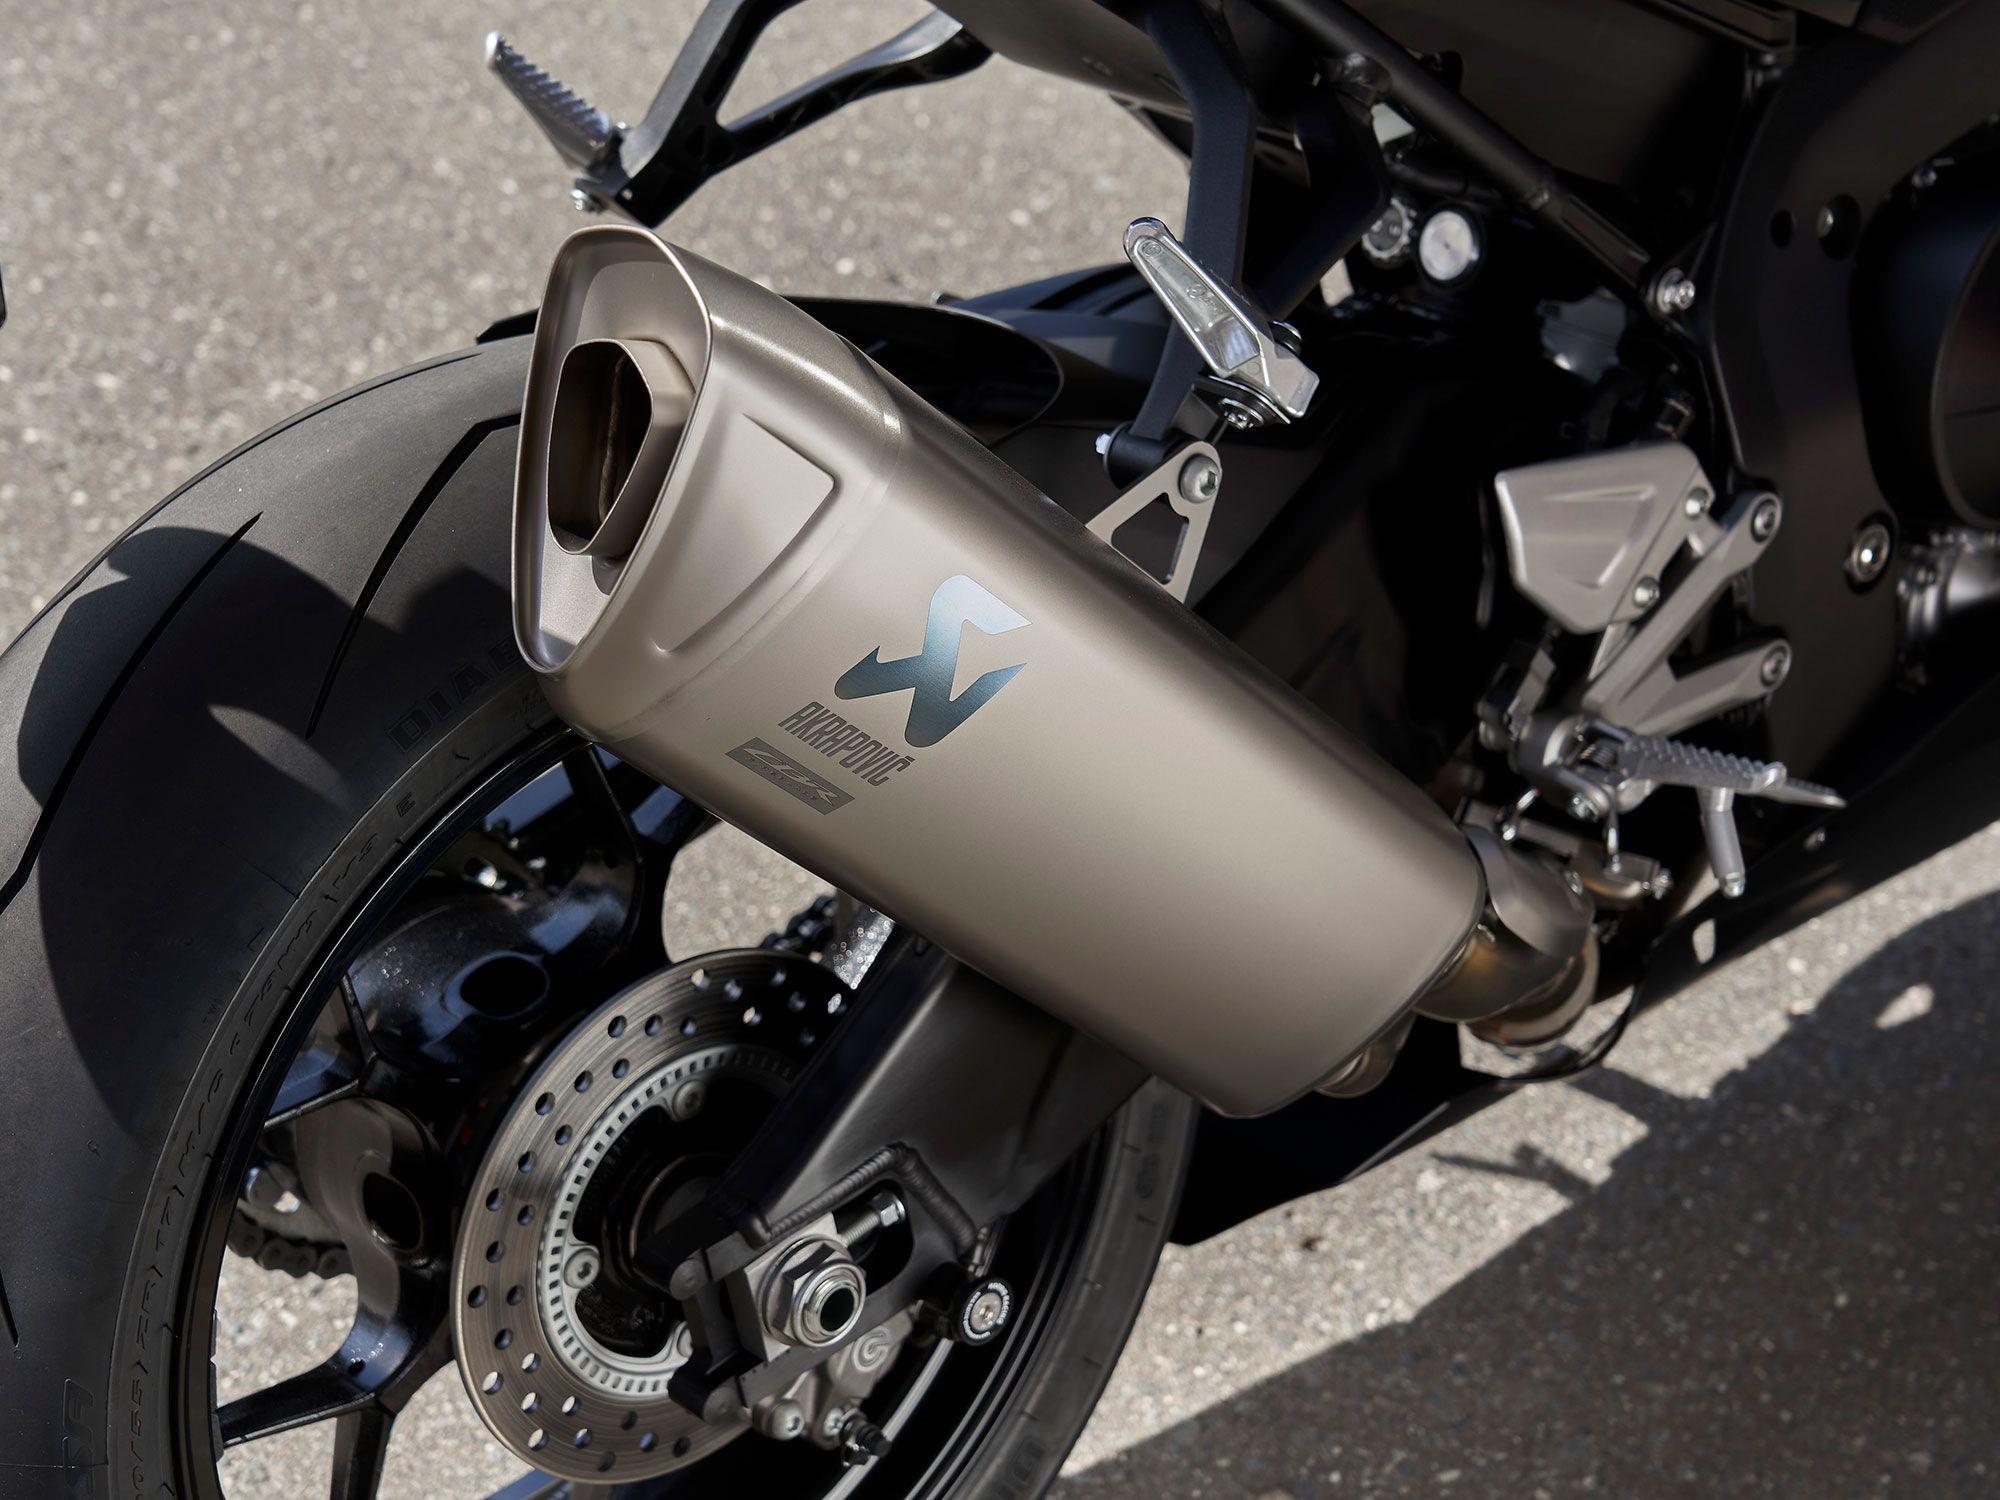 This titanium Akrapovič exhaust adds to the premium feel of the Fireblade SP.